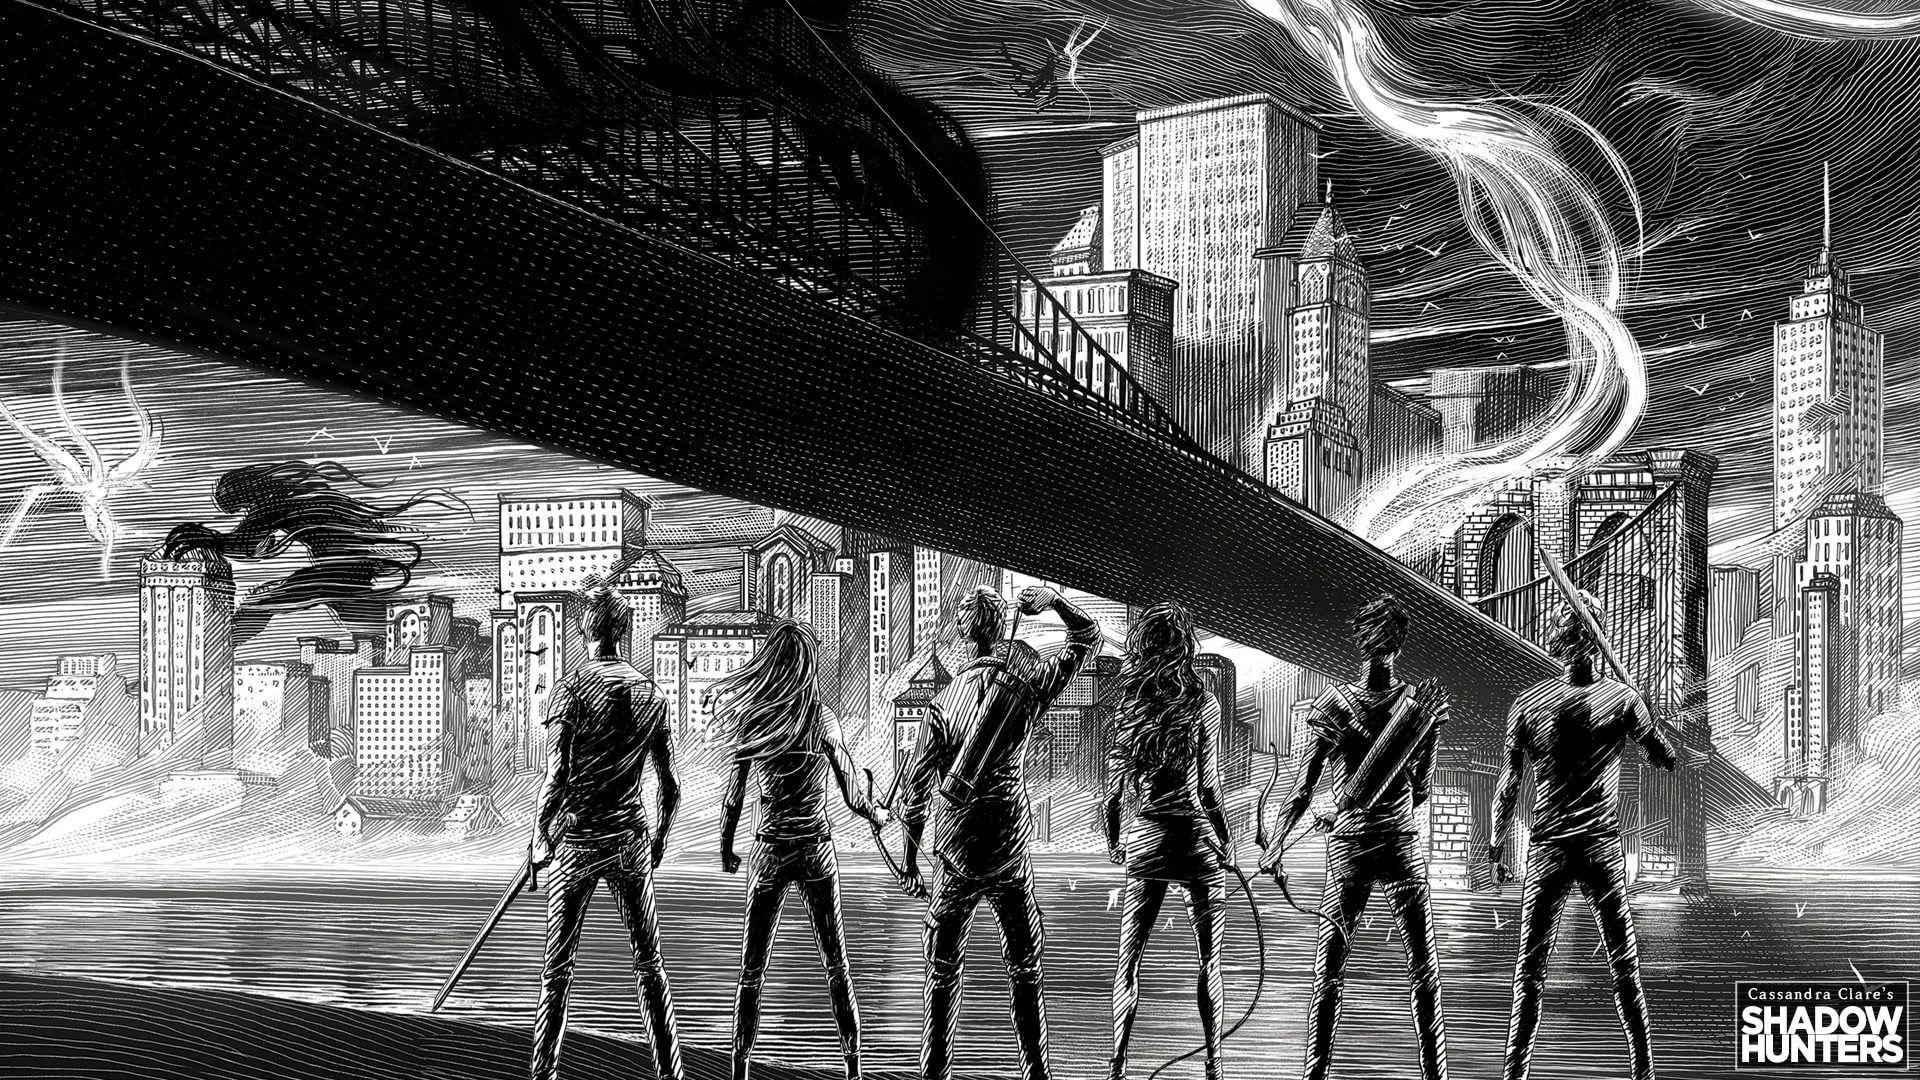 Shadowhunters Wallpaper